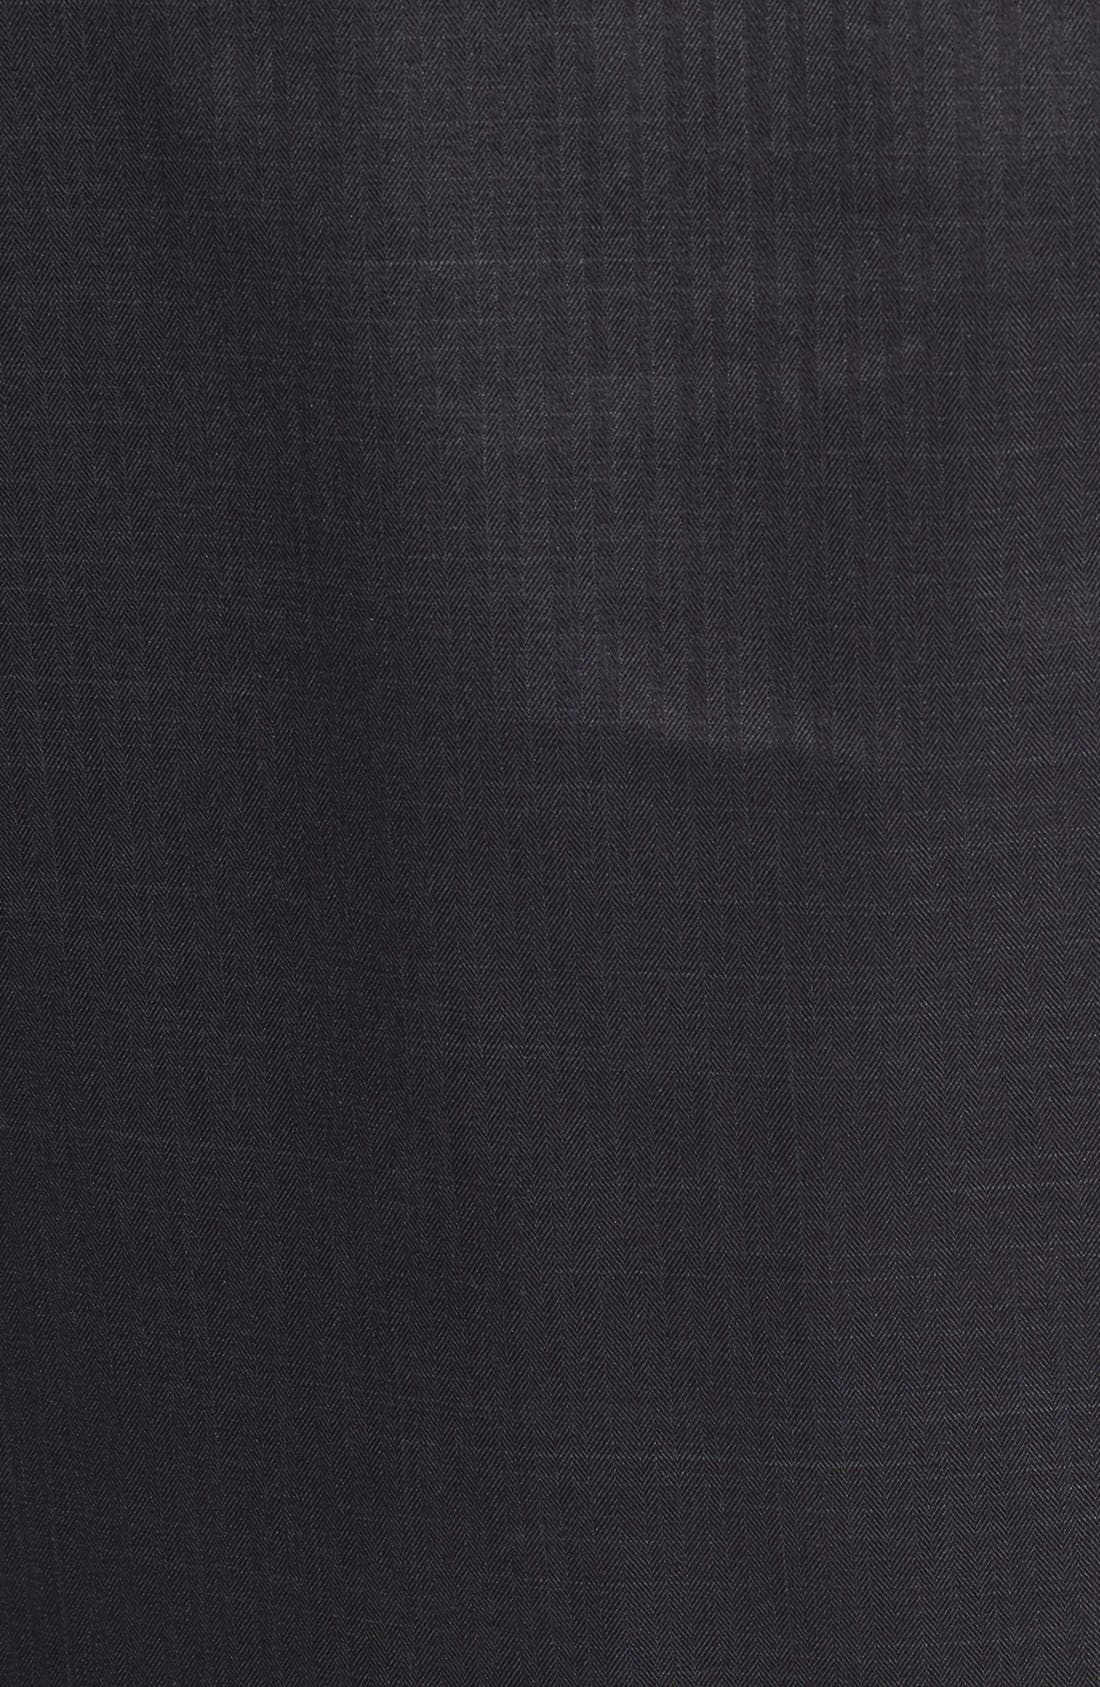 HELLY HANSEN,                             'Denver' Relaxed Fit Herringbone Hooded Jacket,                             Alternate thumbnail 4, color,                             001